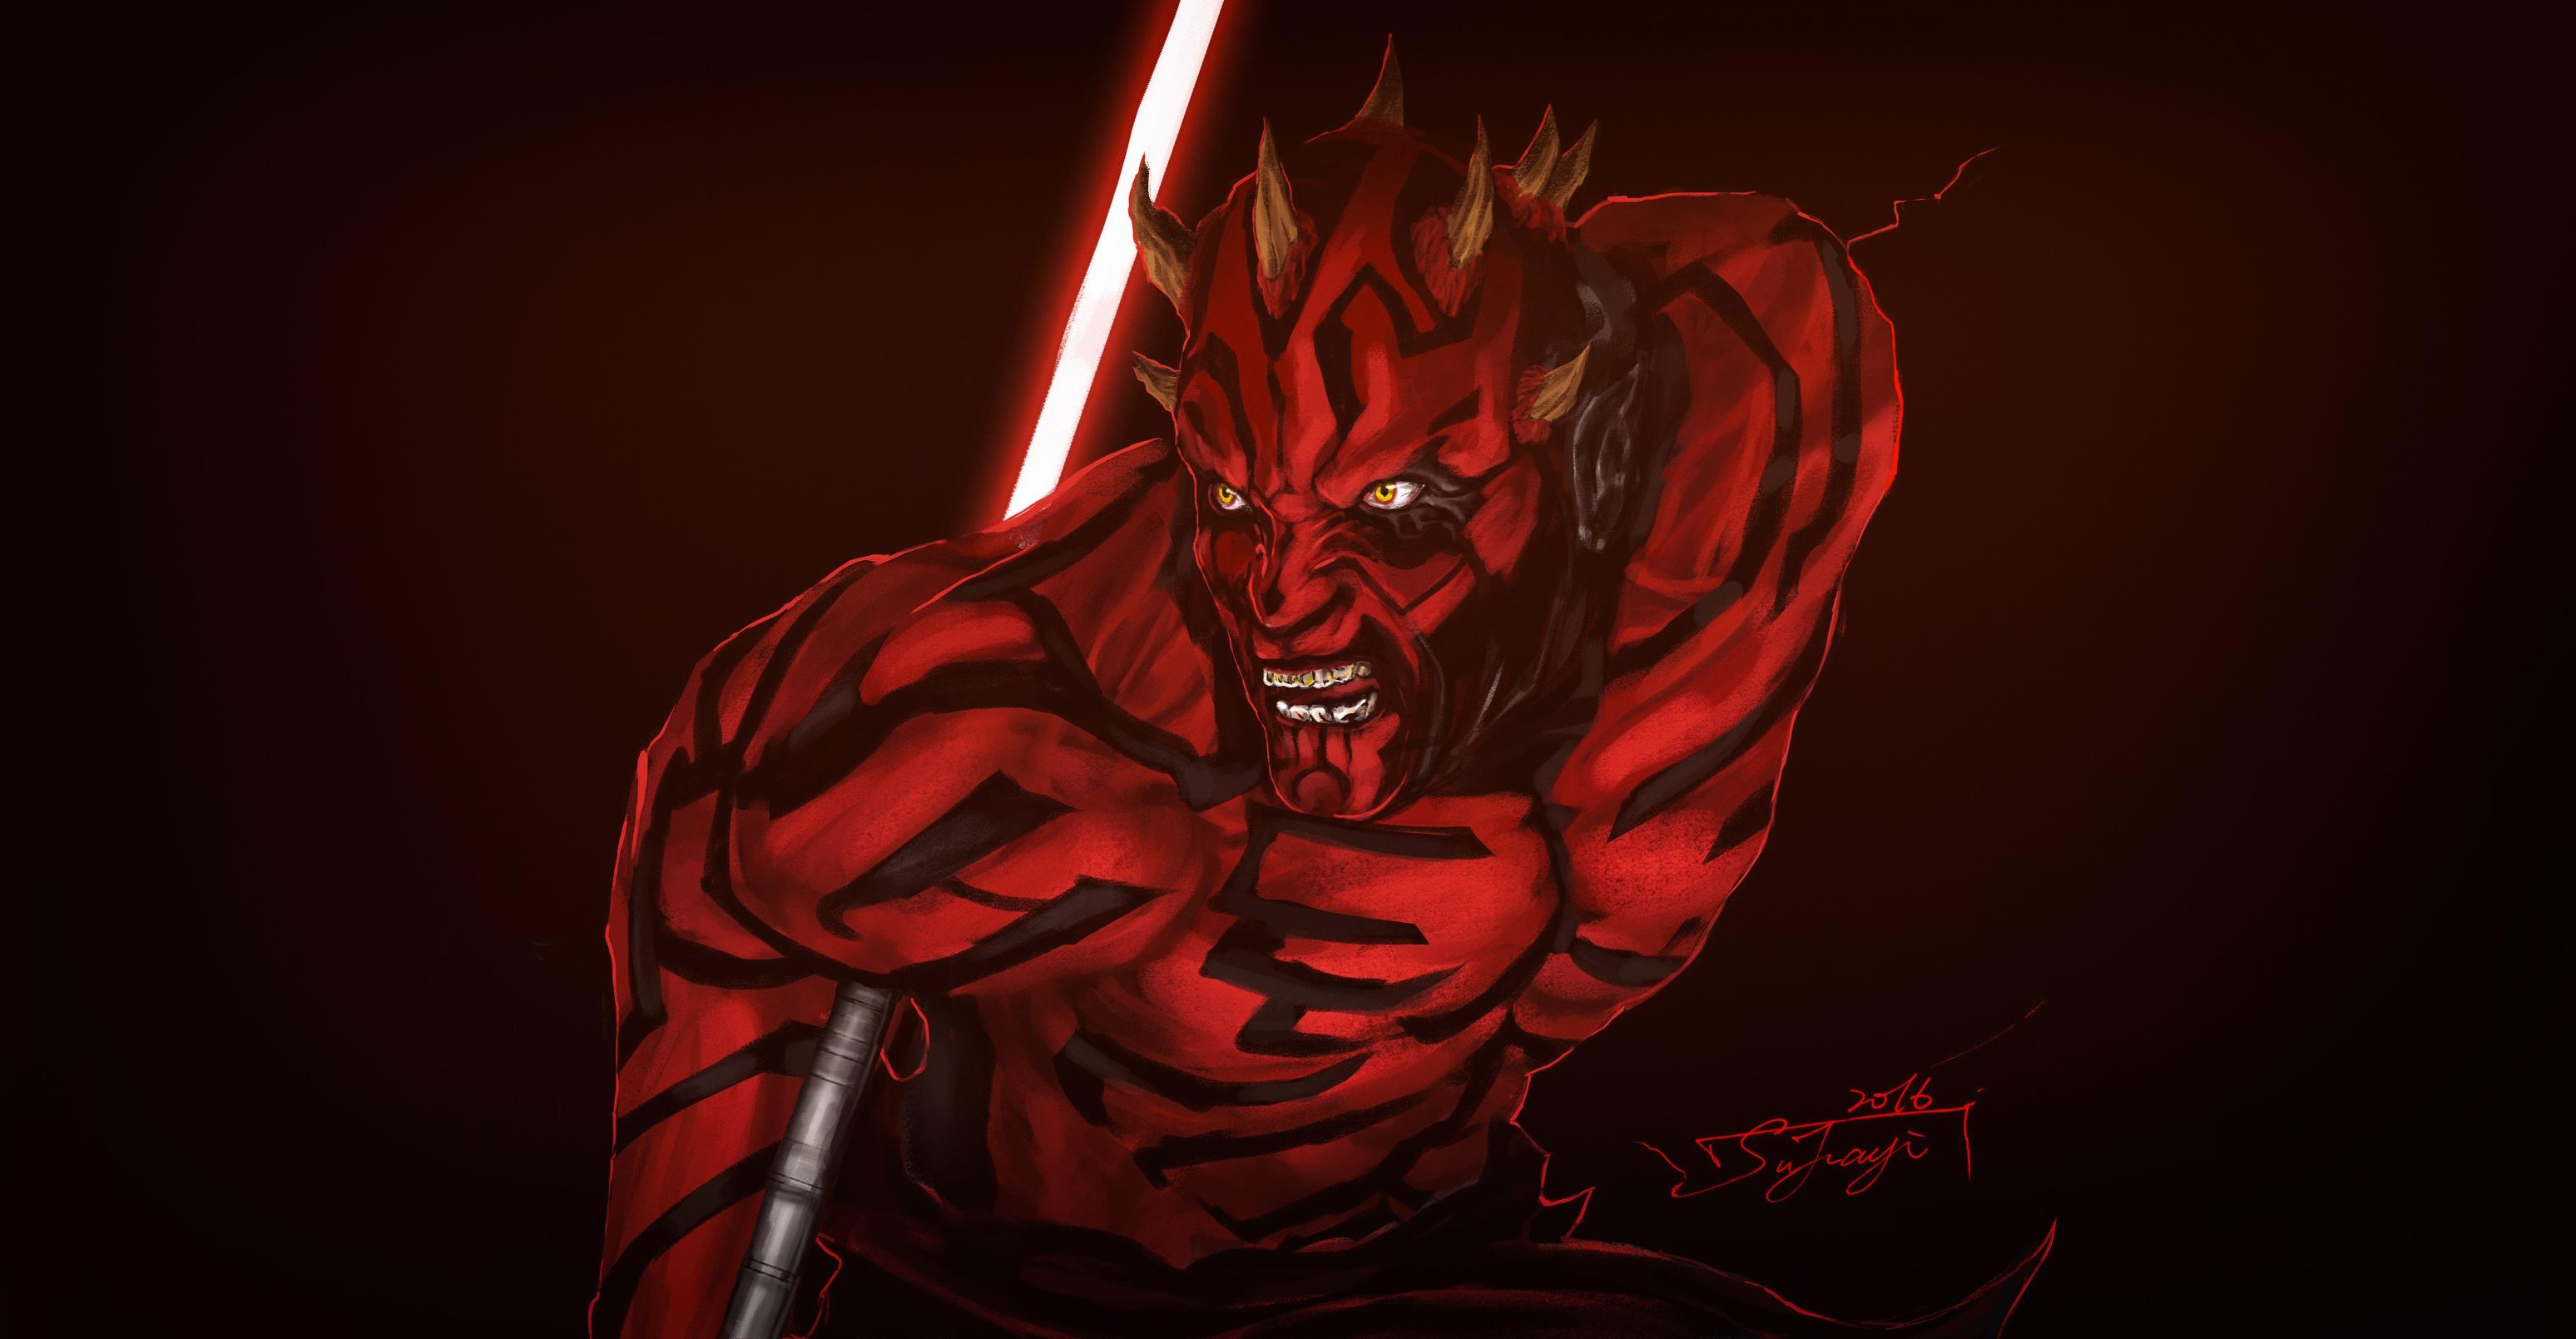 darth maul star wars oz